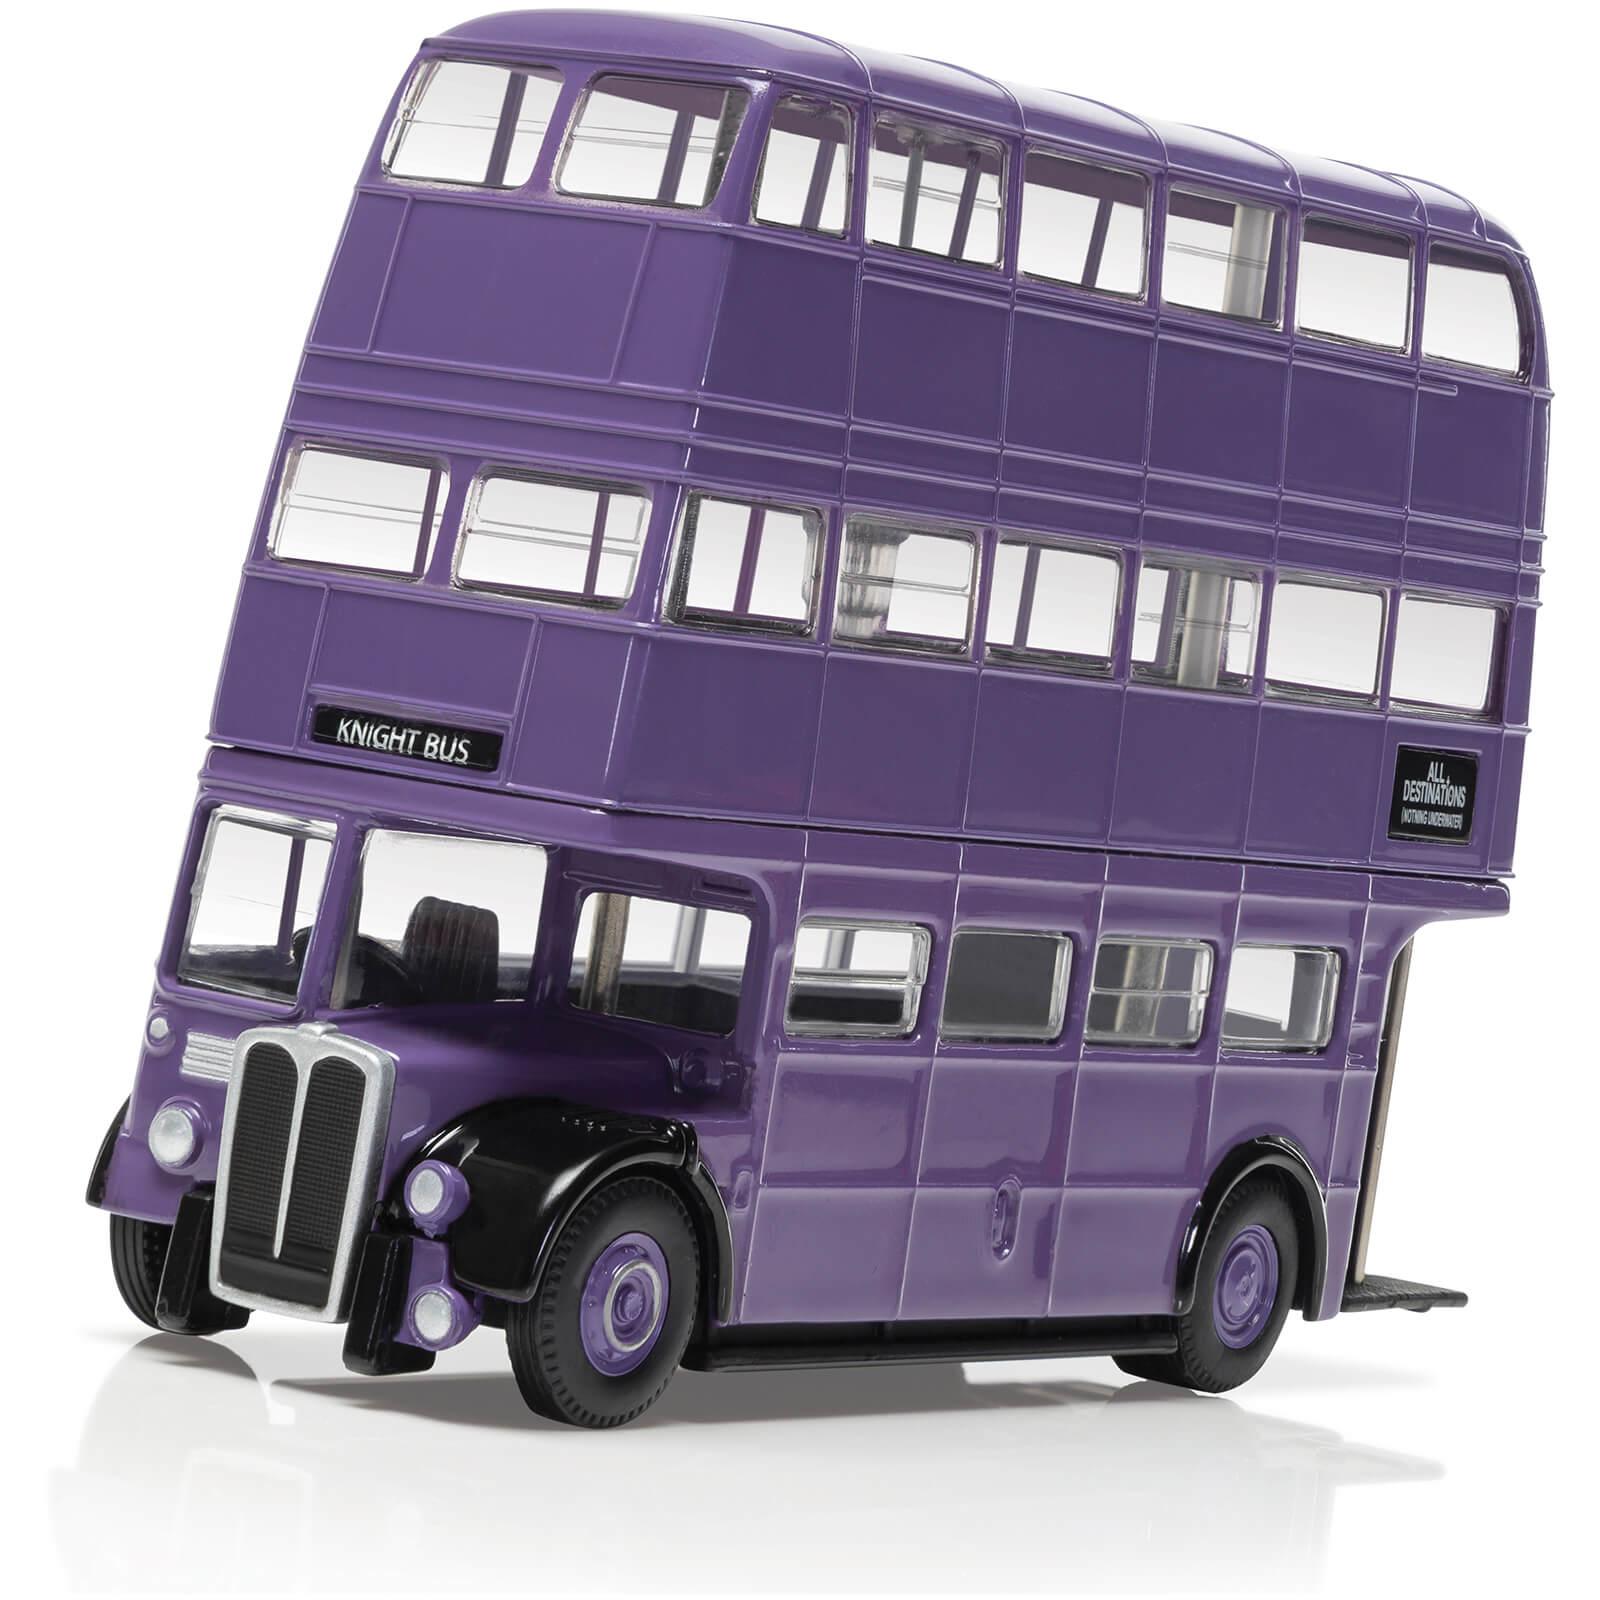 Image of Harry Potter Triple Decker Knight Bus Model Set - Scale 1:76